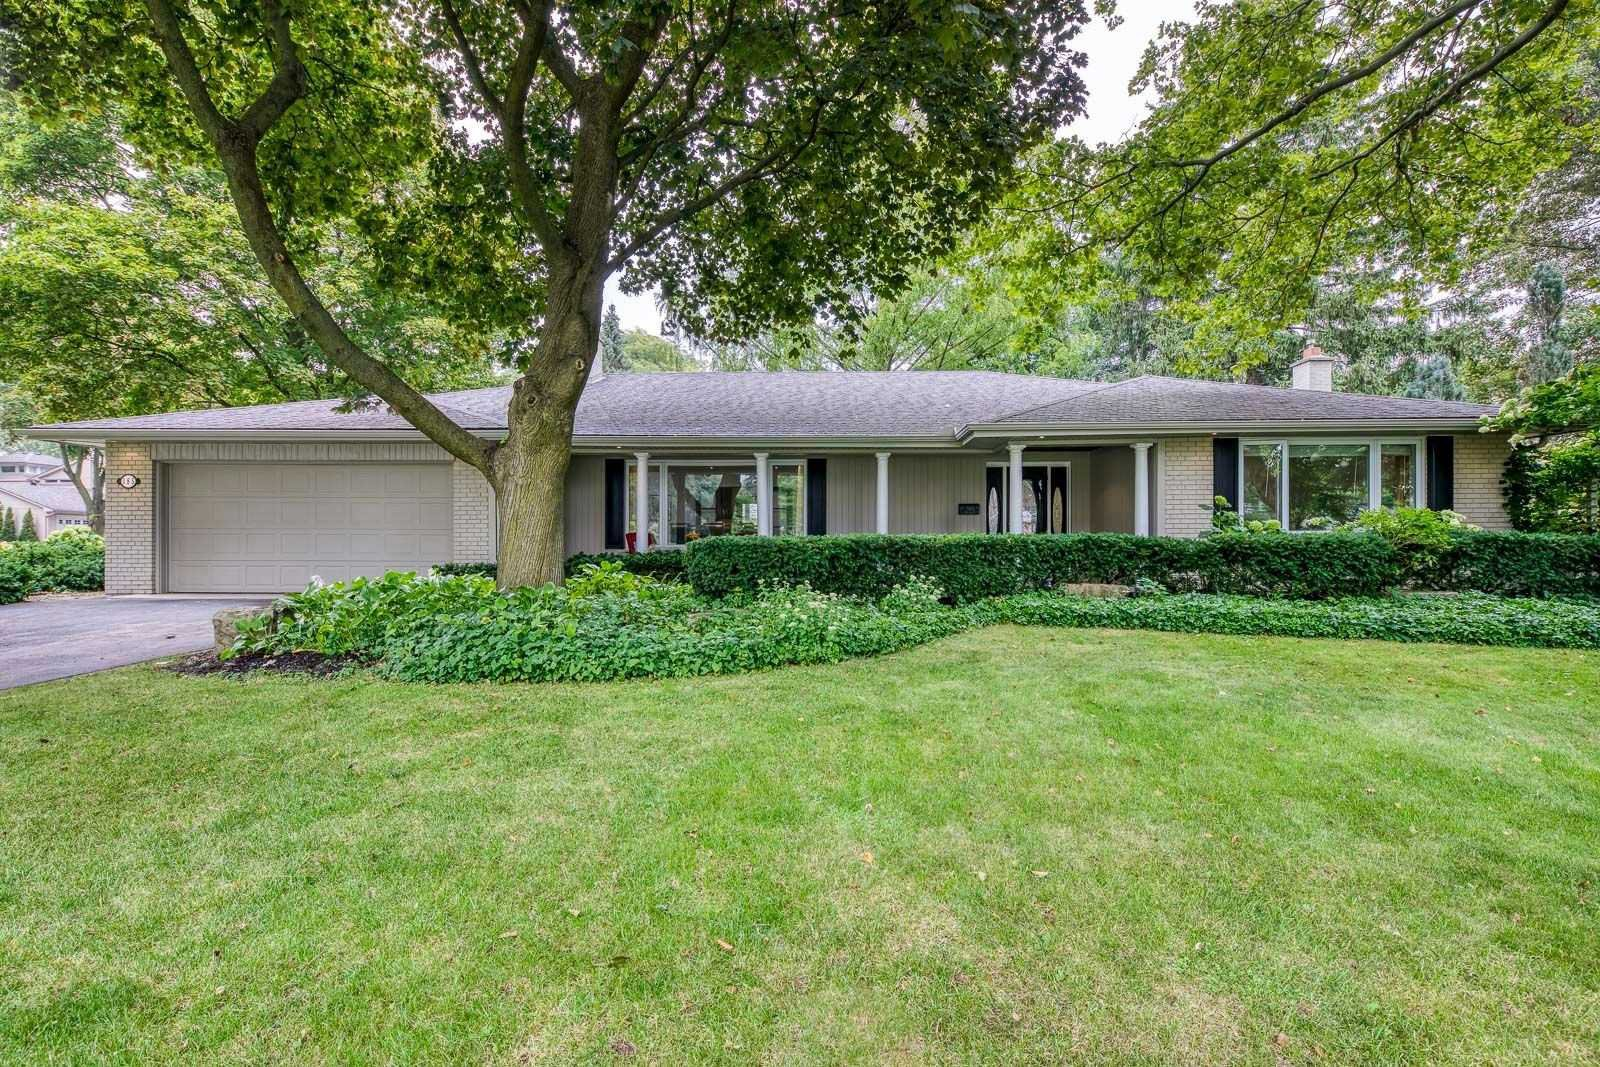 Main Photo: 185 Dornie Road in Oakville: Eastlake House (Bungalow) for sale : MLS®# W4905401